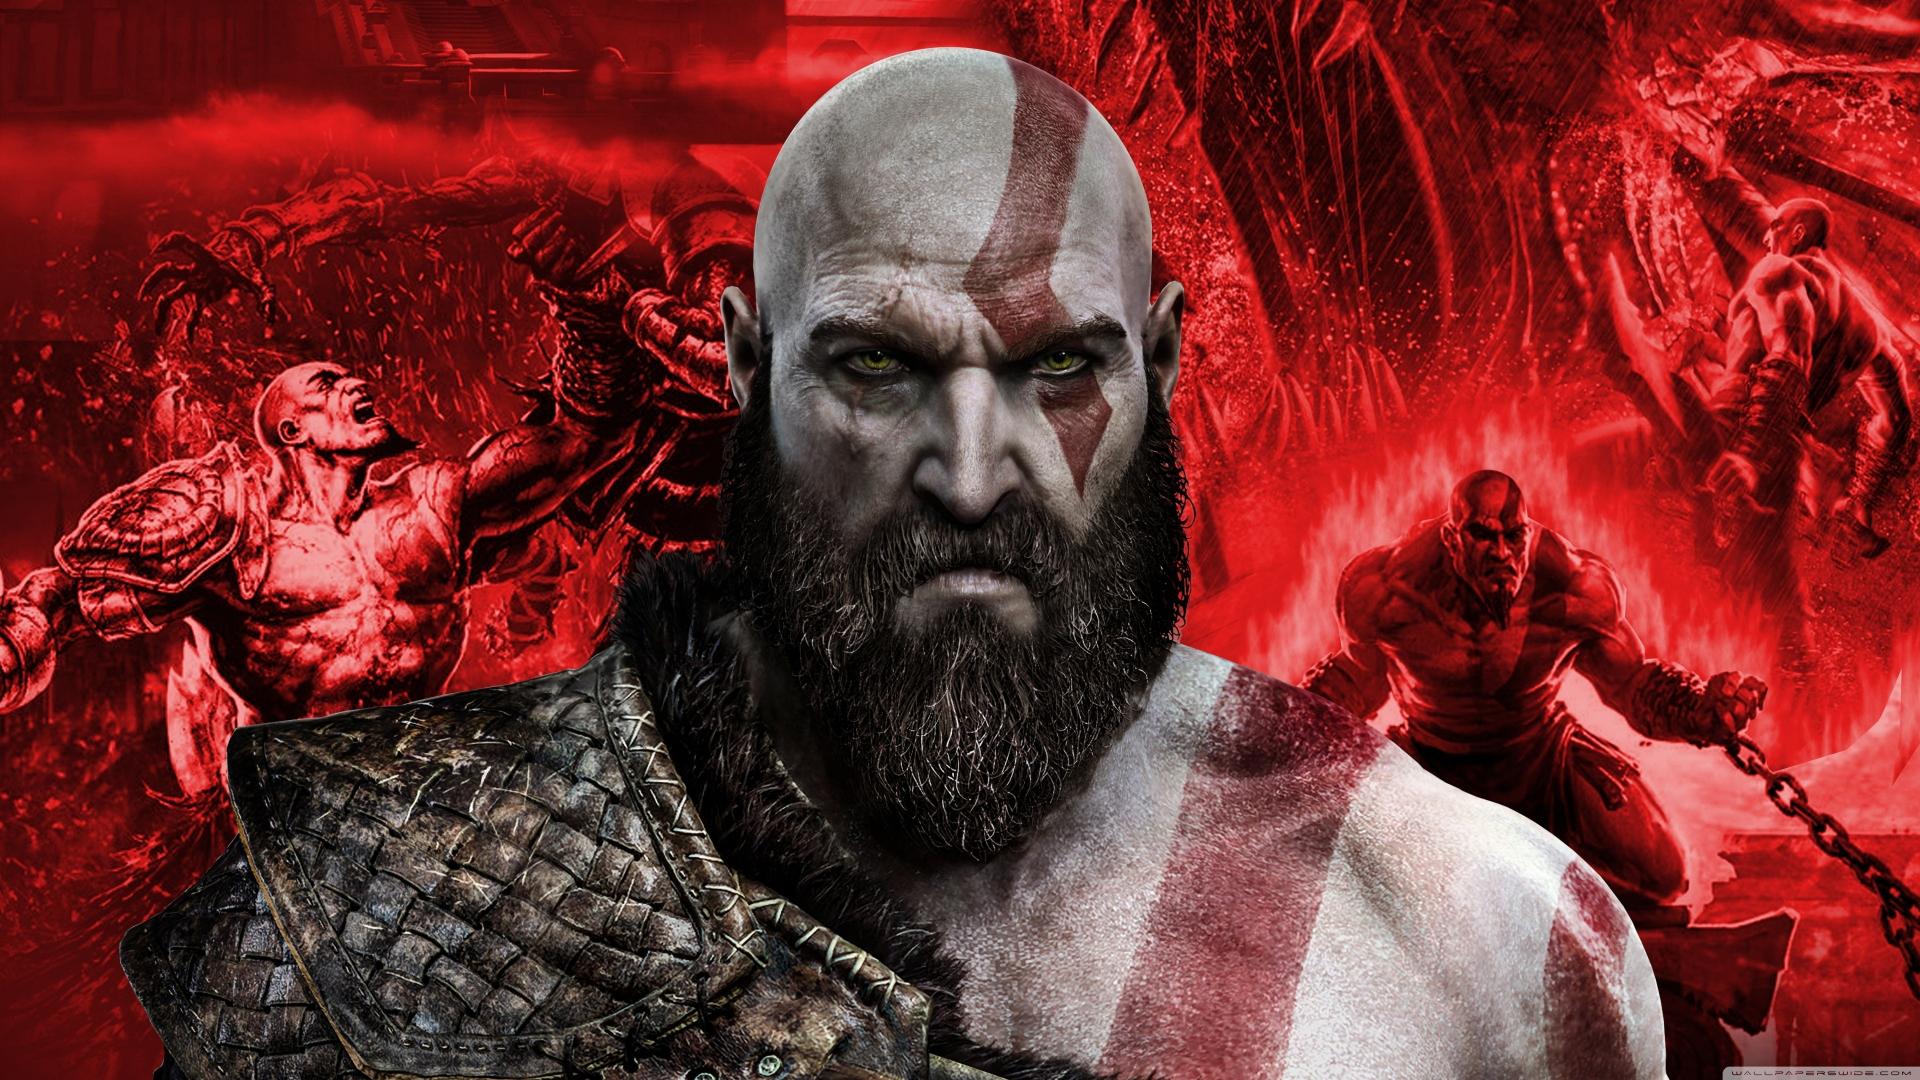 Download 1920x1080 Wallpaper Kratos Artwork God Of War Full Hd